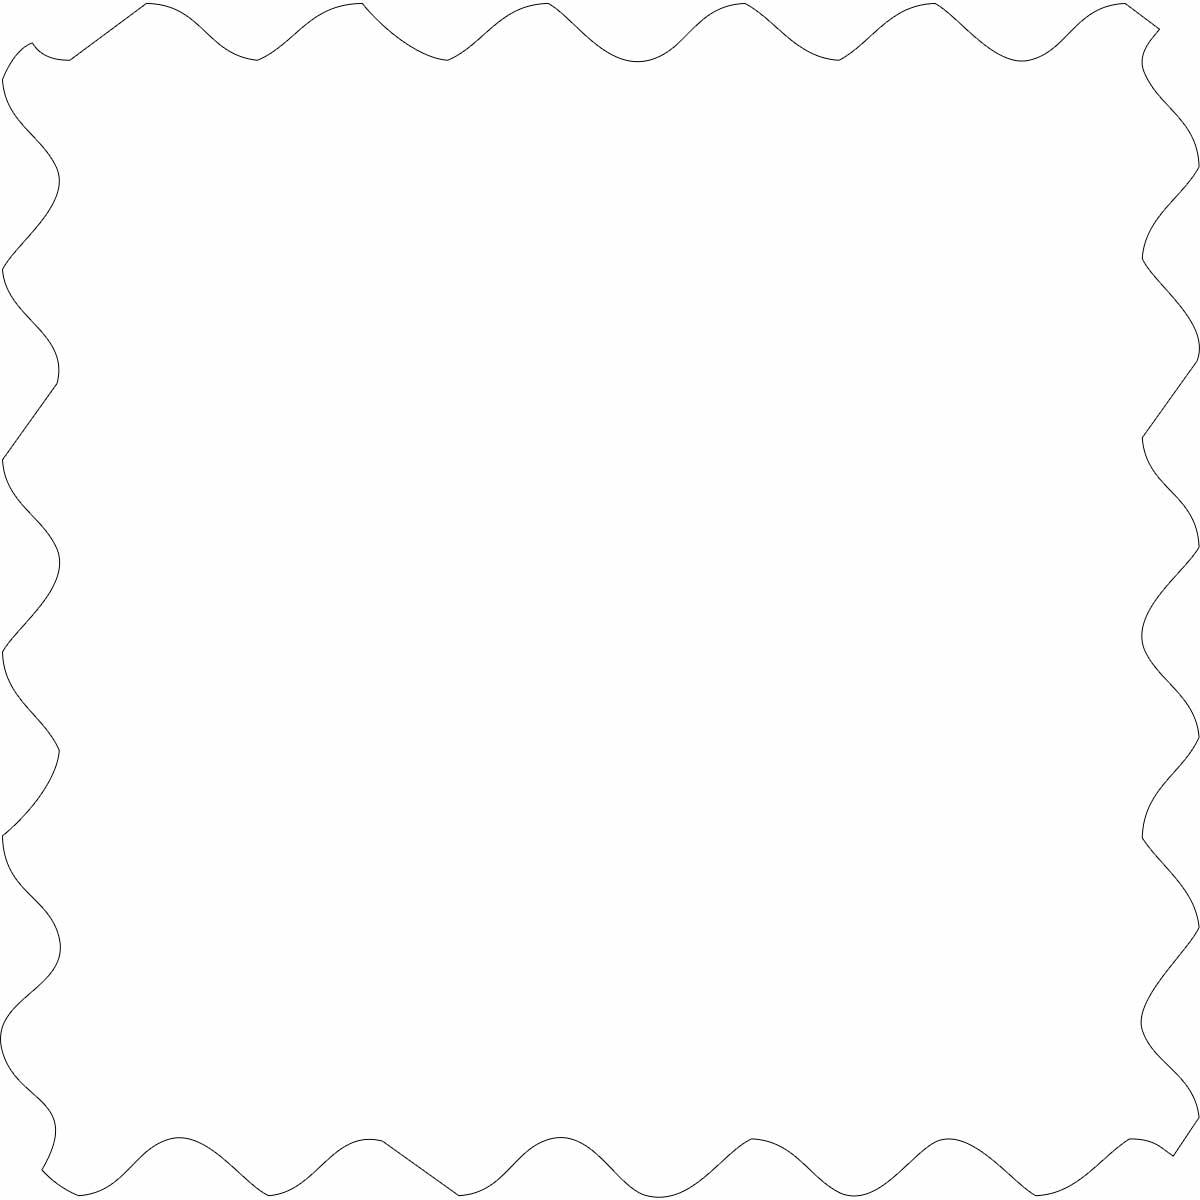 Fabric Creations™ Plush™ 3-D Fabric Paints - White, 2 oz.